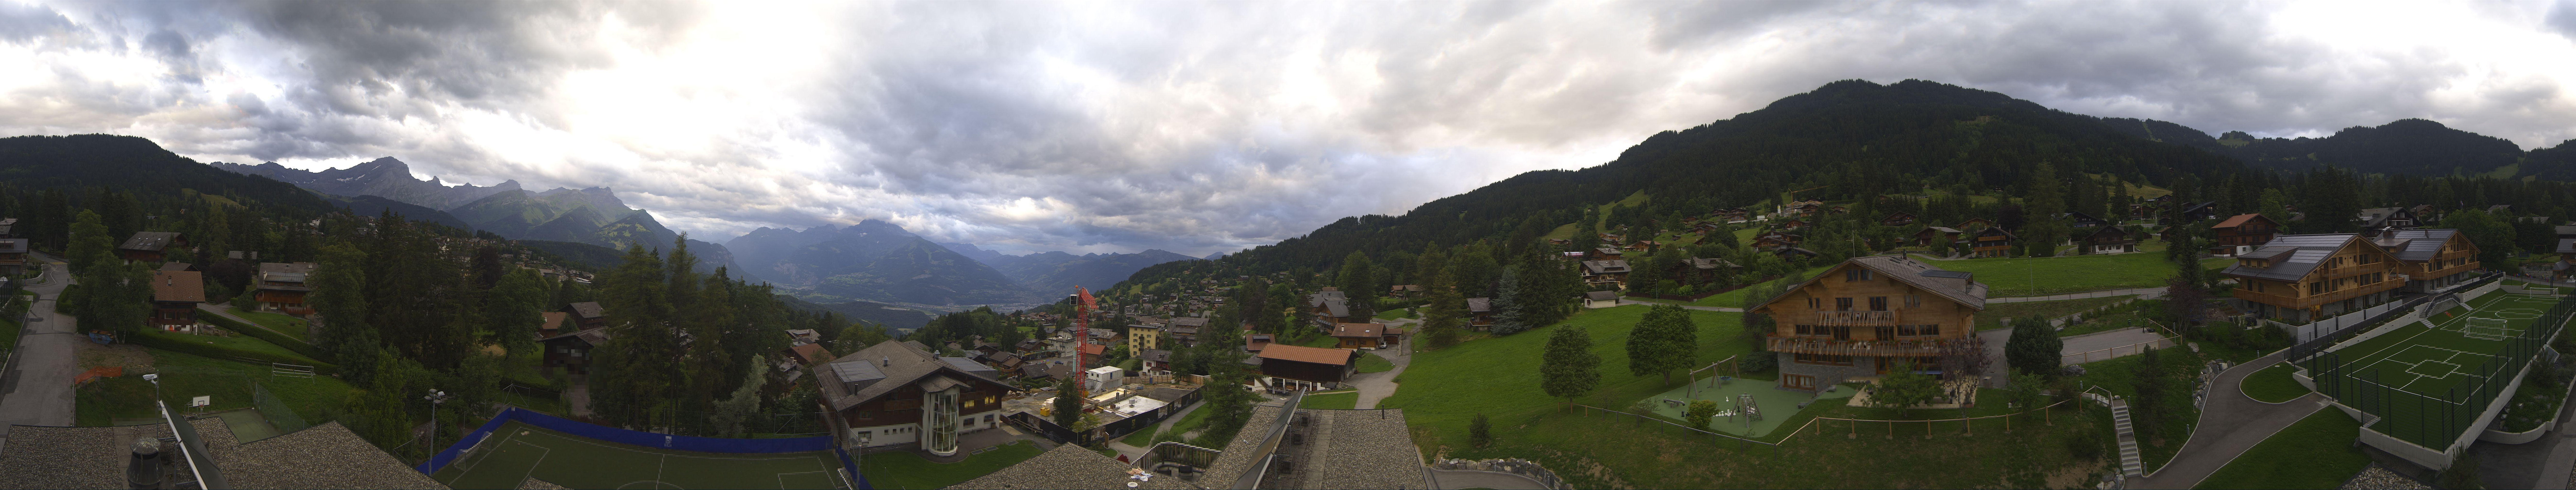 Ollon: Villars-sur - Vaud